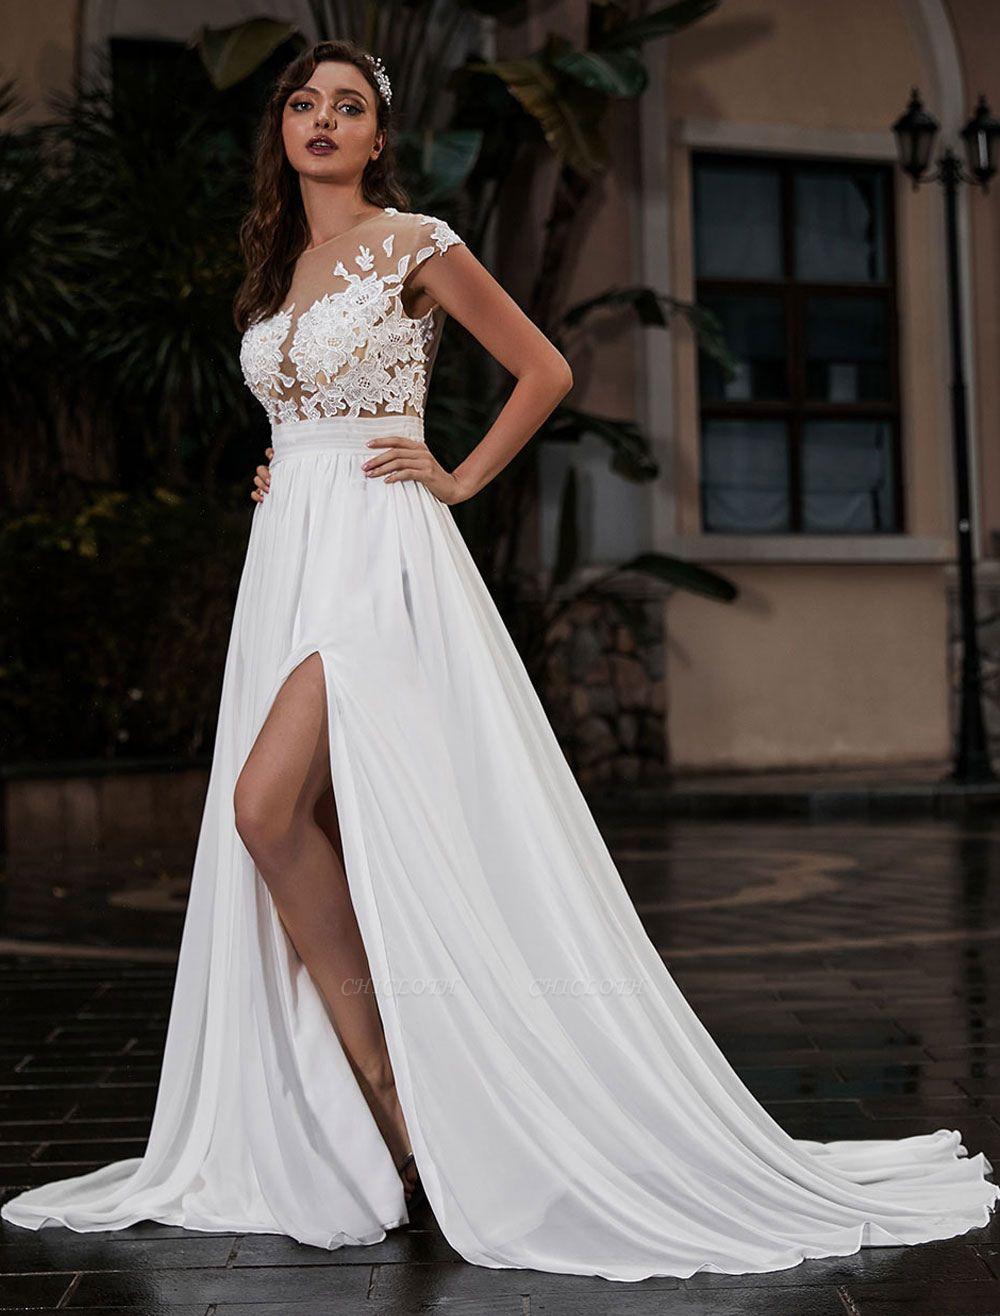 Wedding Gowns Beach A-Line Silhouette Jewel Neck Lace Bodice Chiffon Wedding Gown